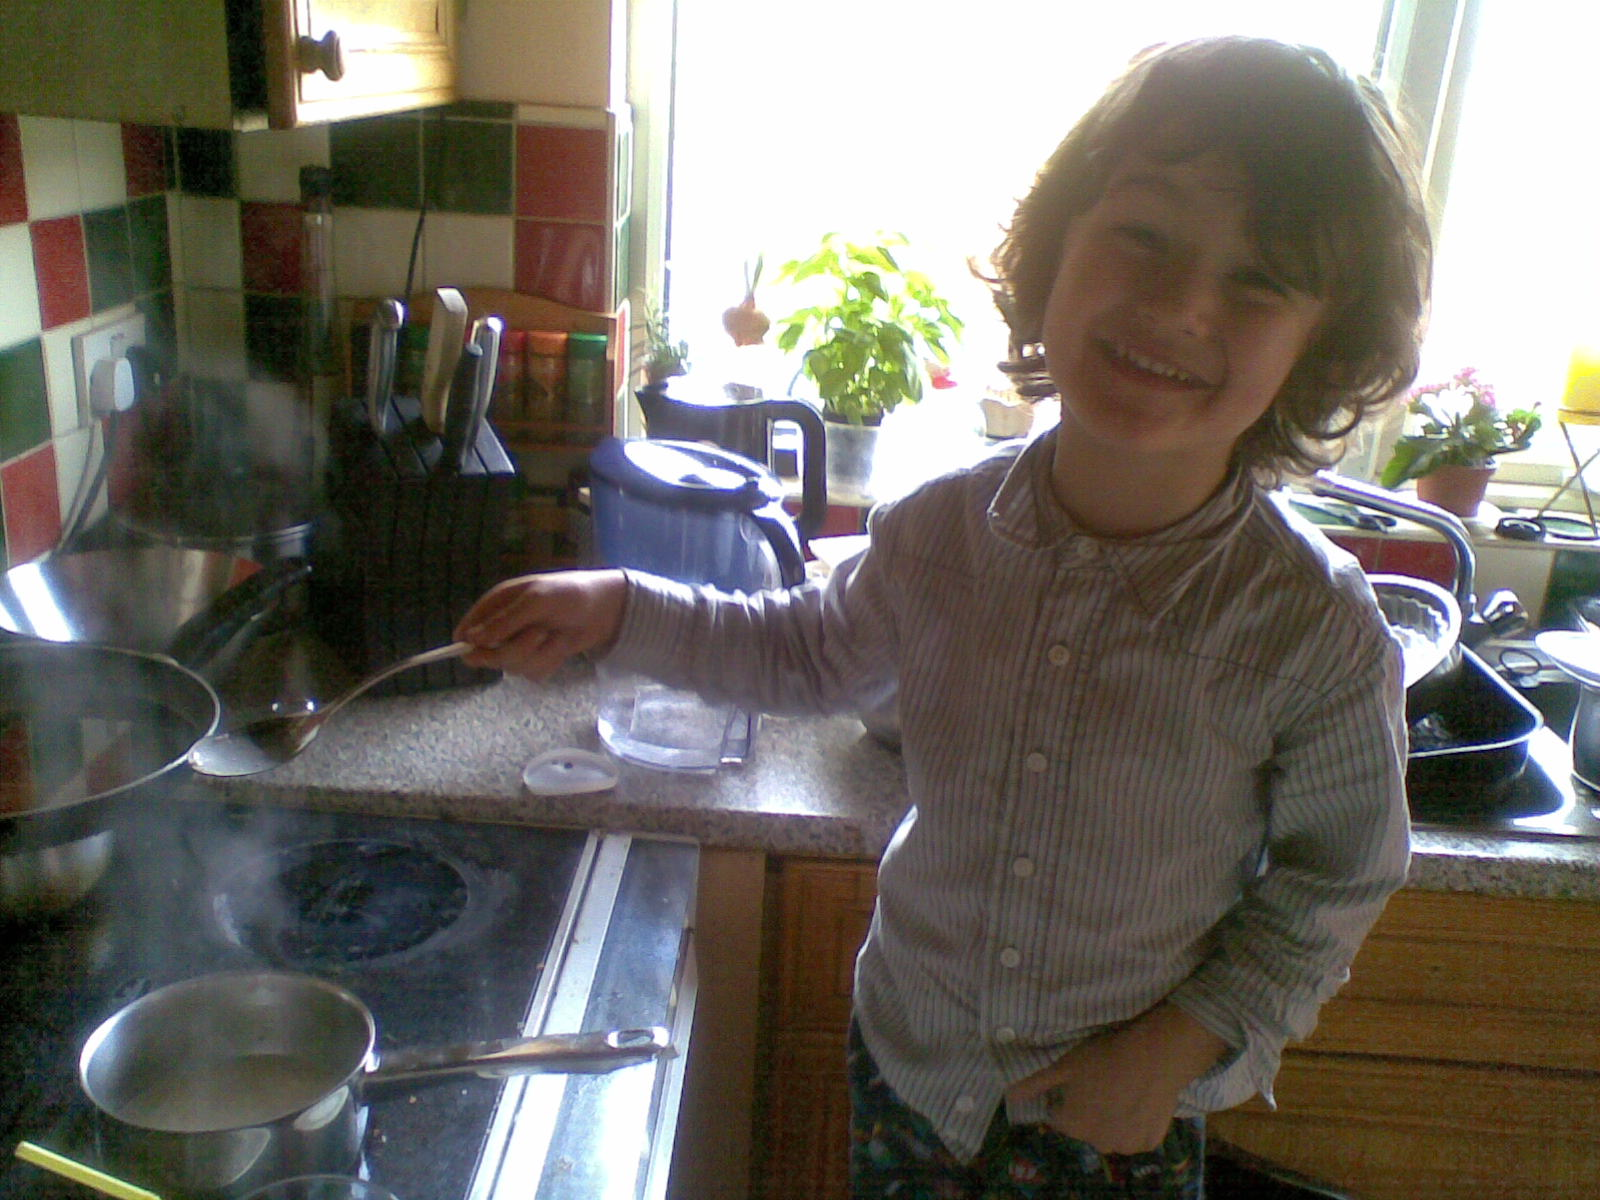 Teach them to cook